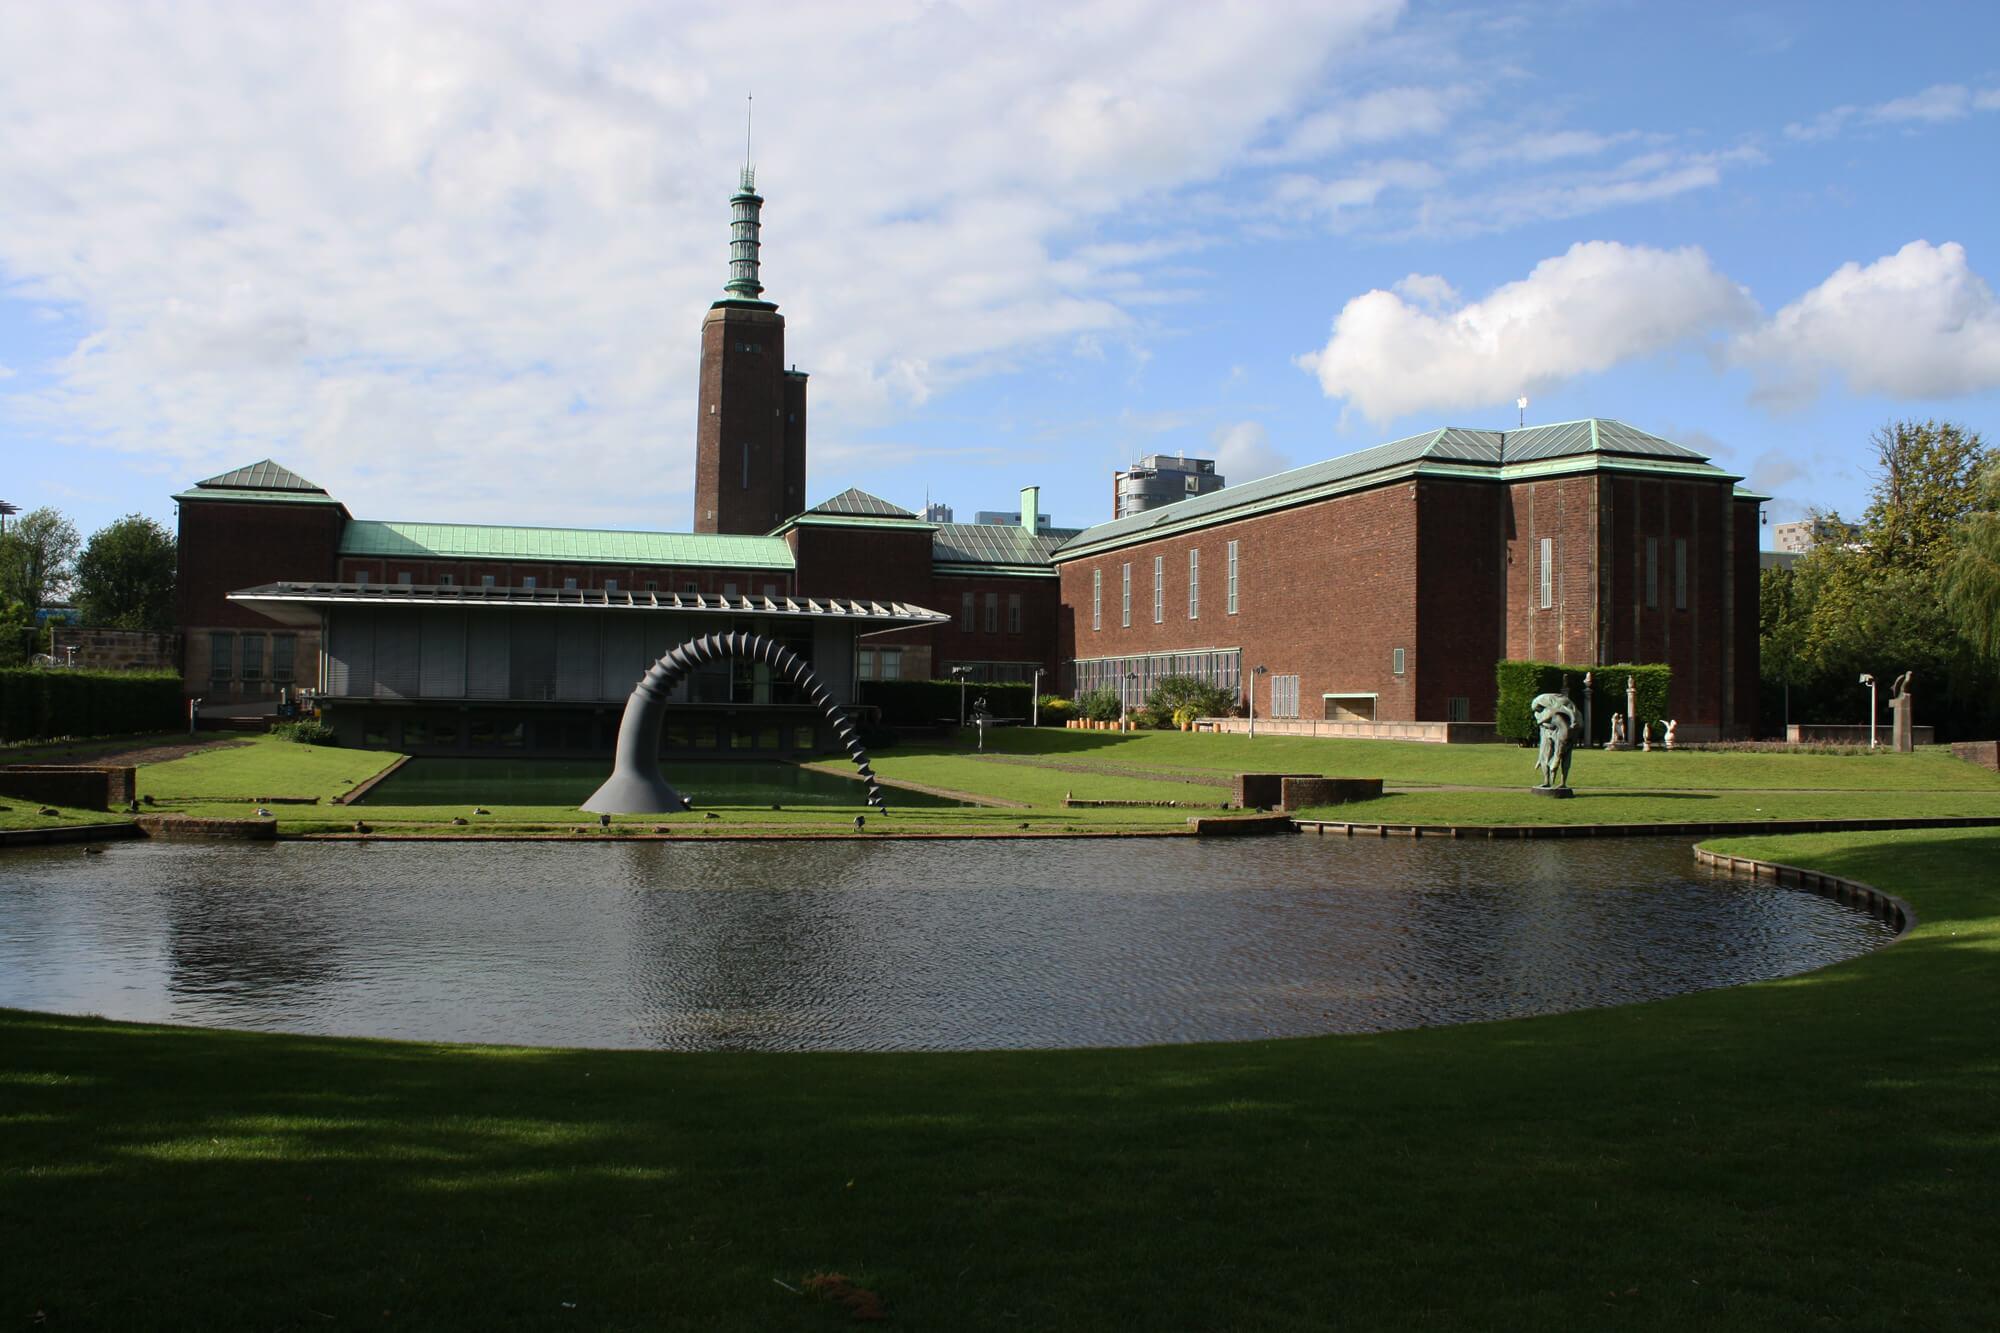 Музей Бойманса Ван Бёнингена